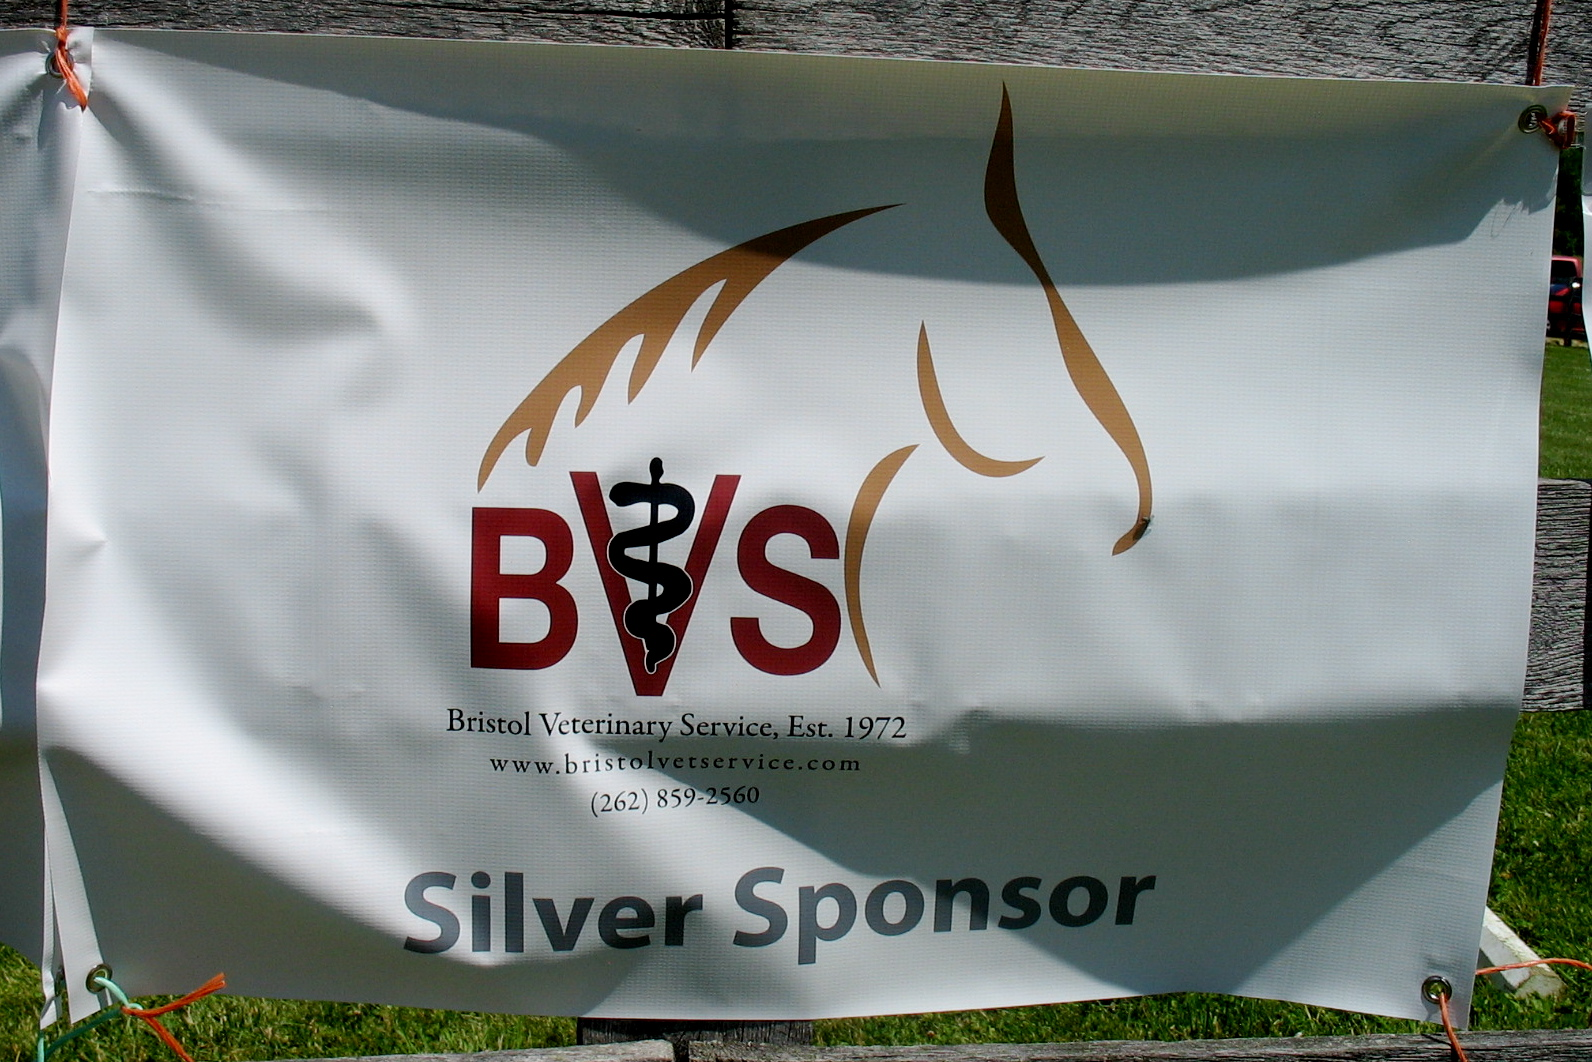 Bristol Veterinary Service  www.bristolvetservice.com